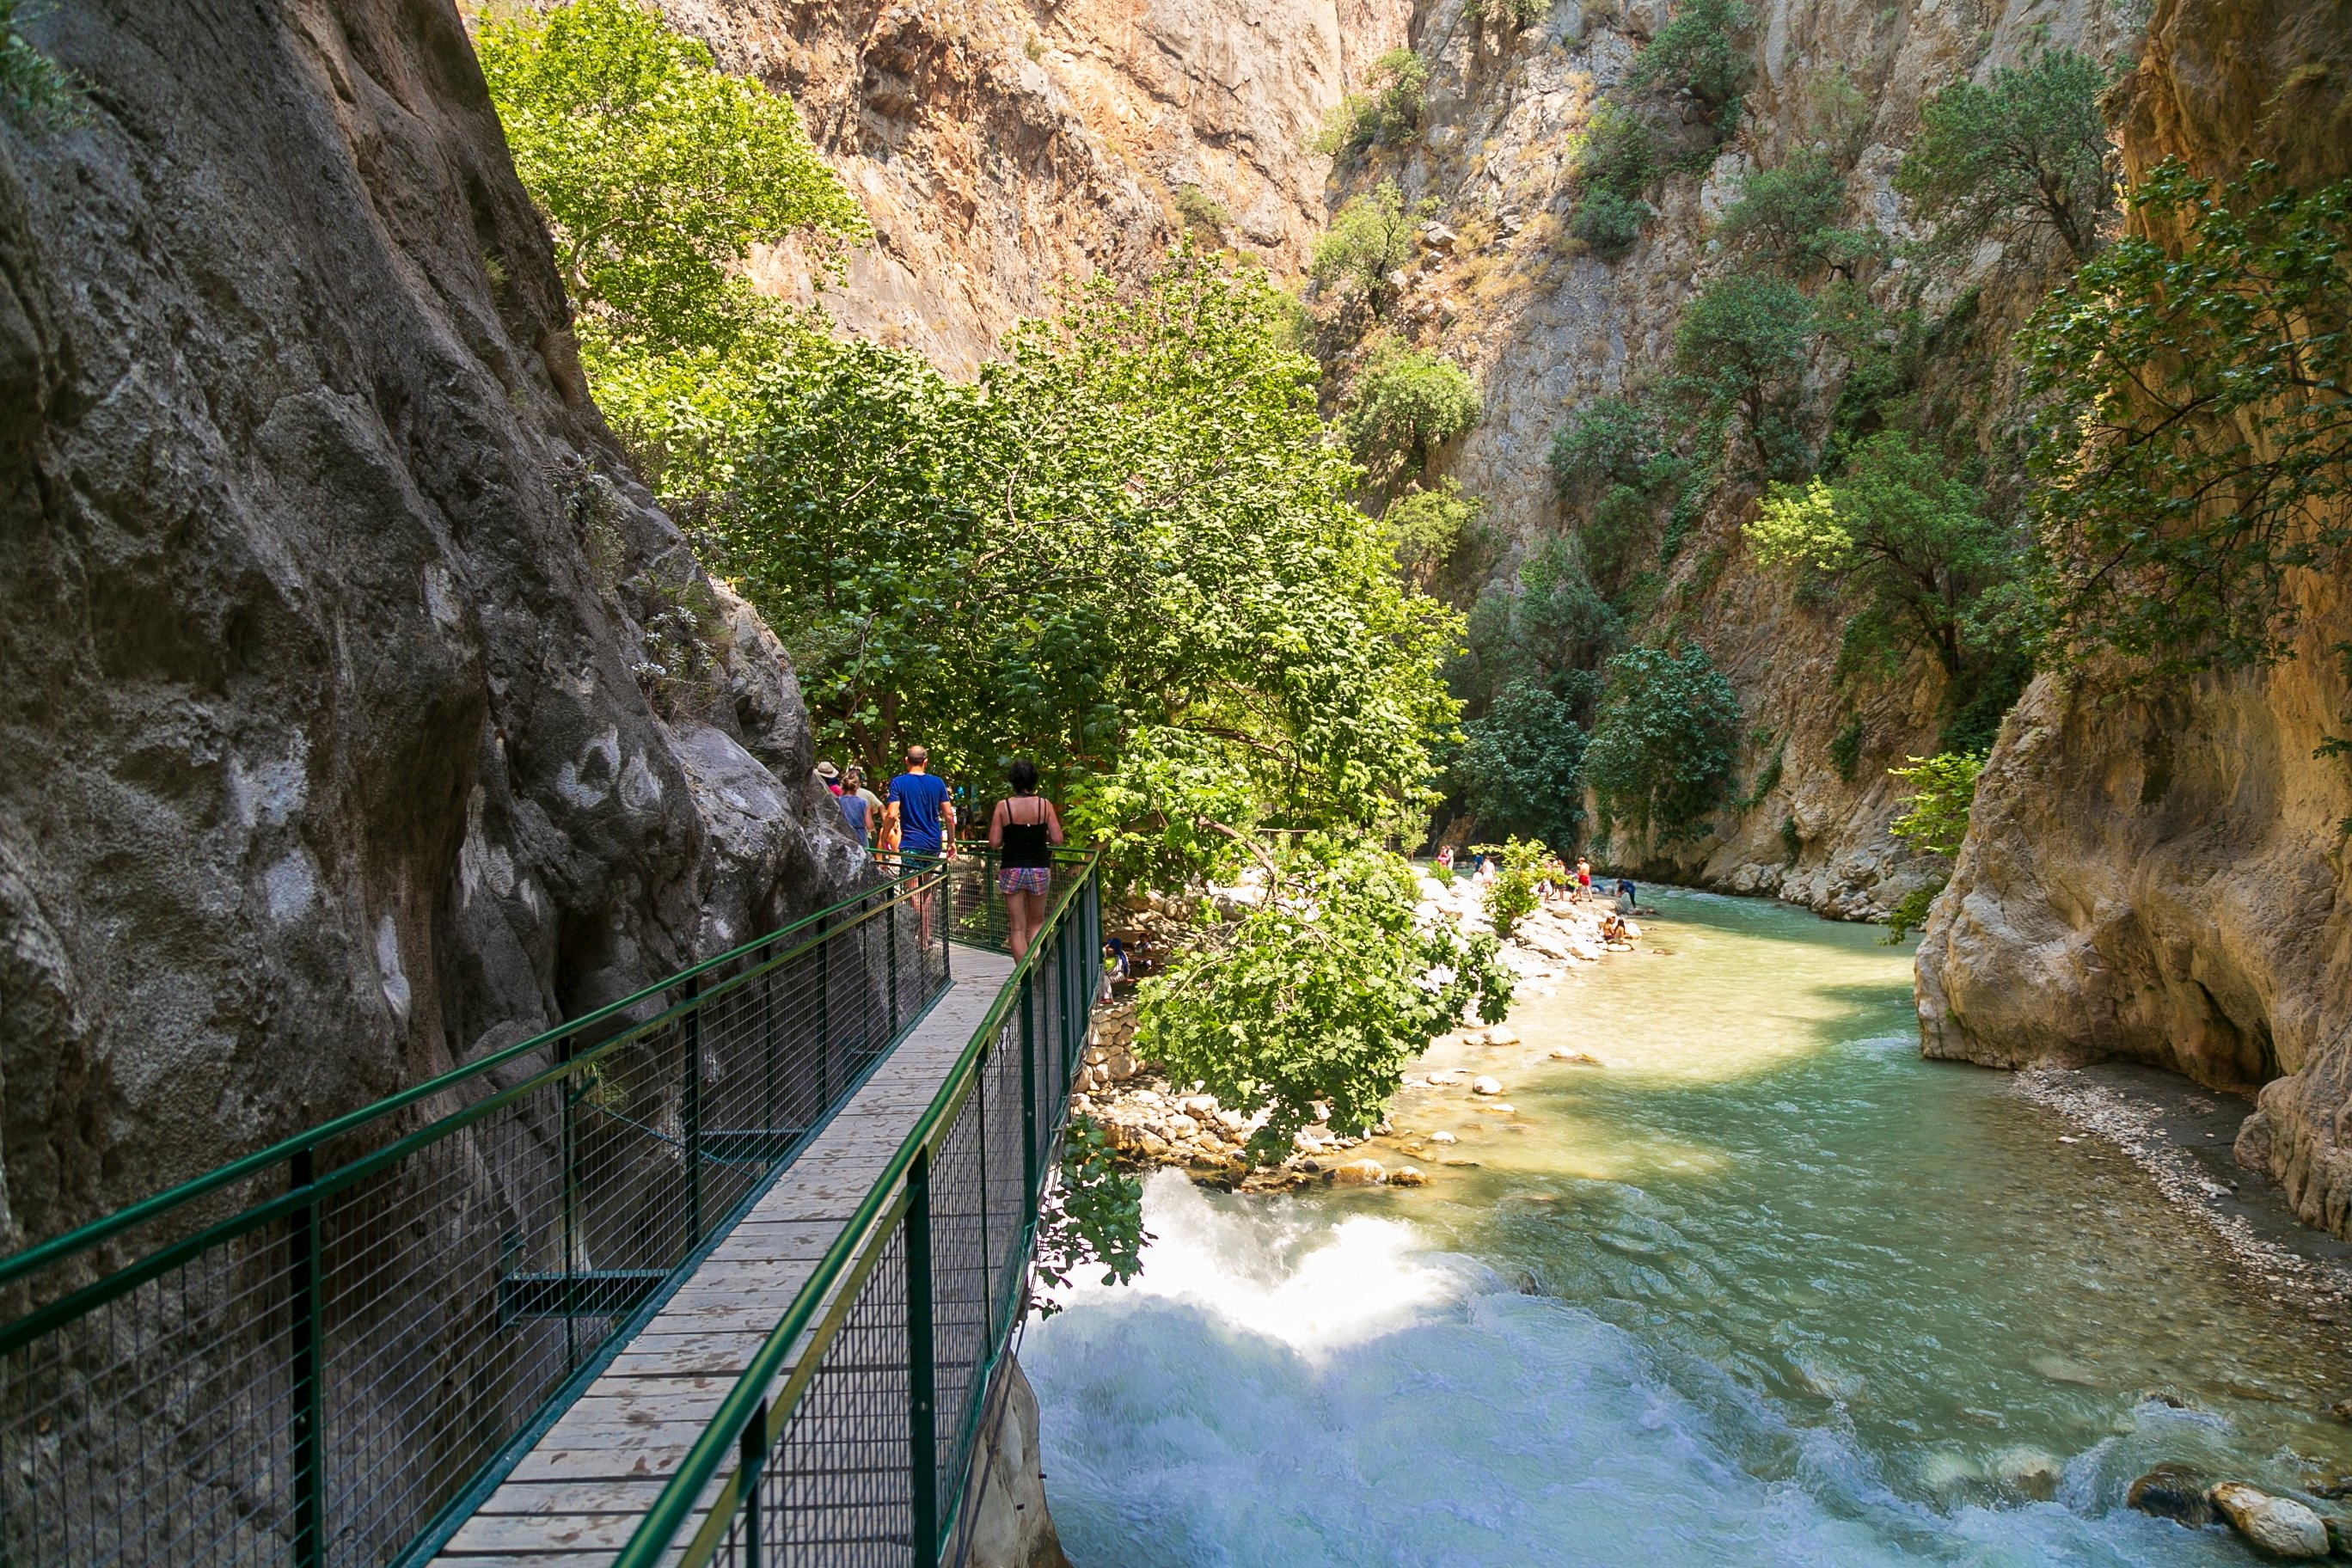 Tourists walk in Saklikent Canyon in southern Turkey. (Shutterstock Photo)